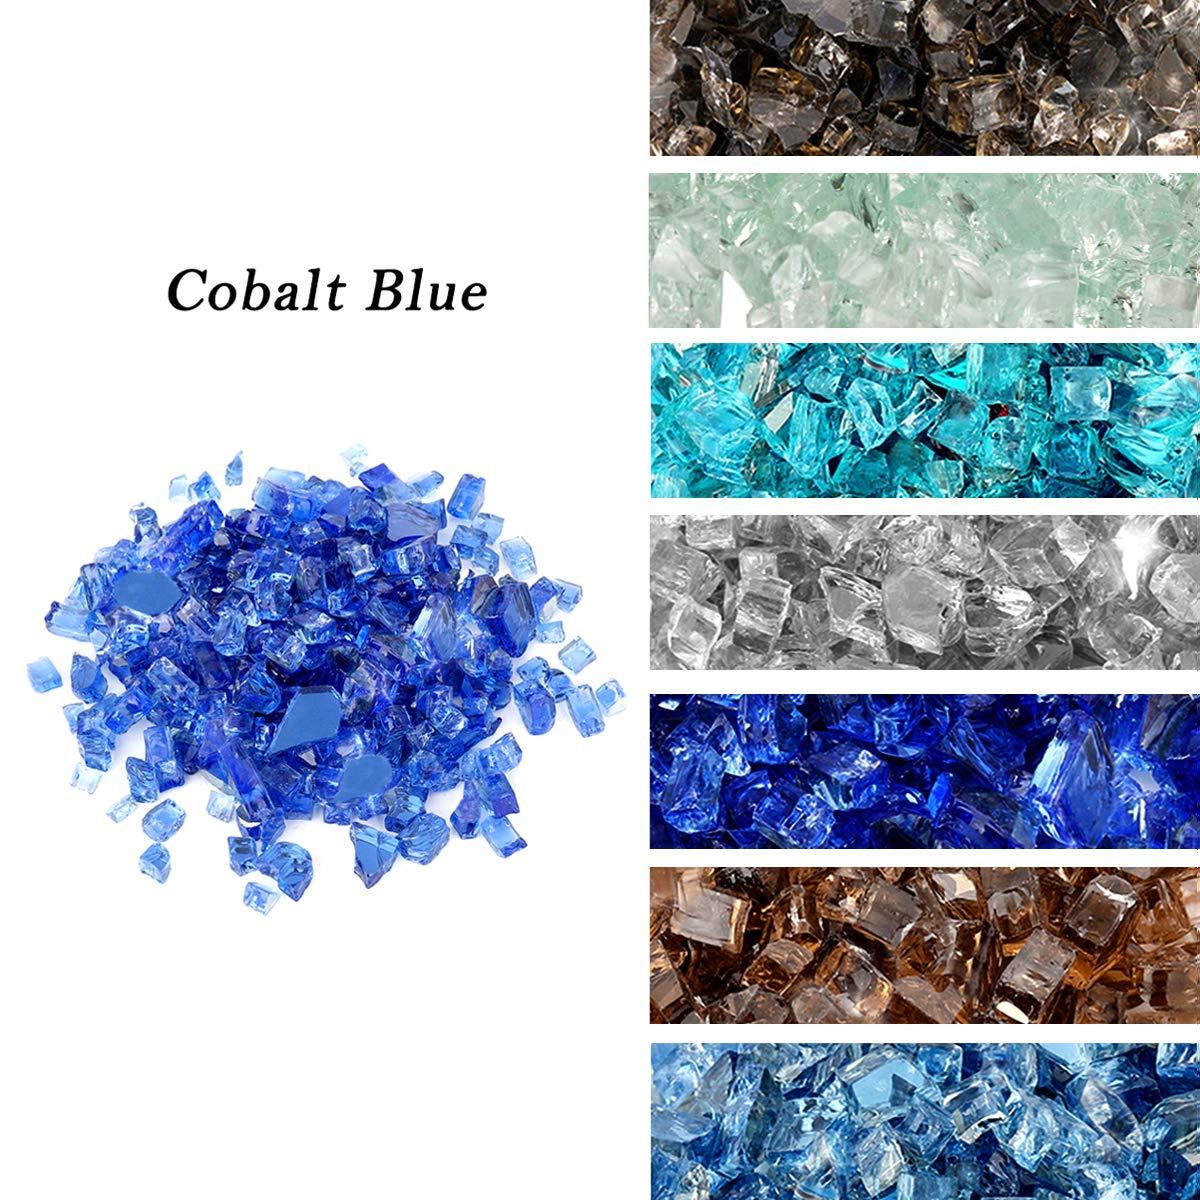 "Skyflame High Luster 10-Pound Regular Fire Glass for Fire Pit Fireplace Garden Landscaping Cobalt Blue 1/4"" Size"